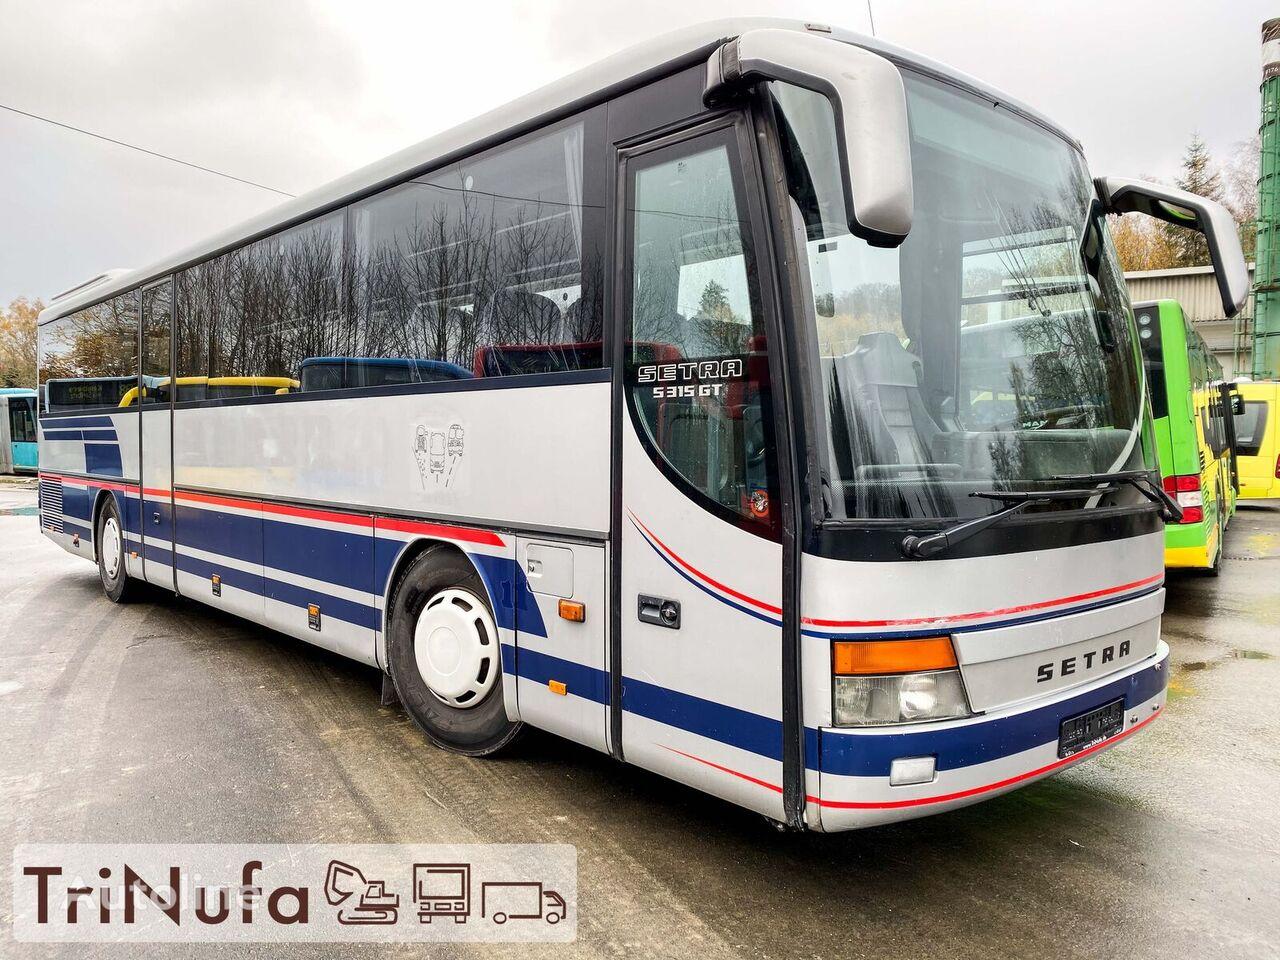 SETRA S 315 GT - UL   Klimaanlage   ATG   Retarder   Überlandbus